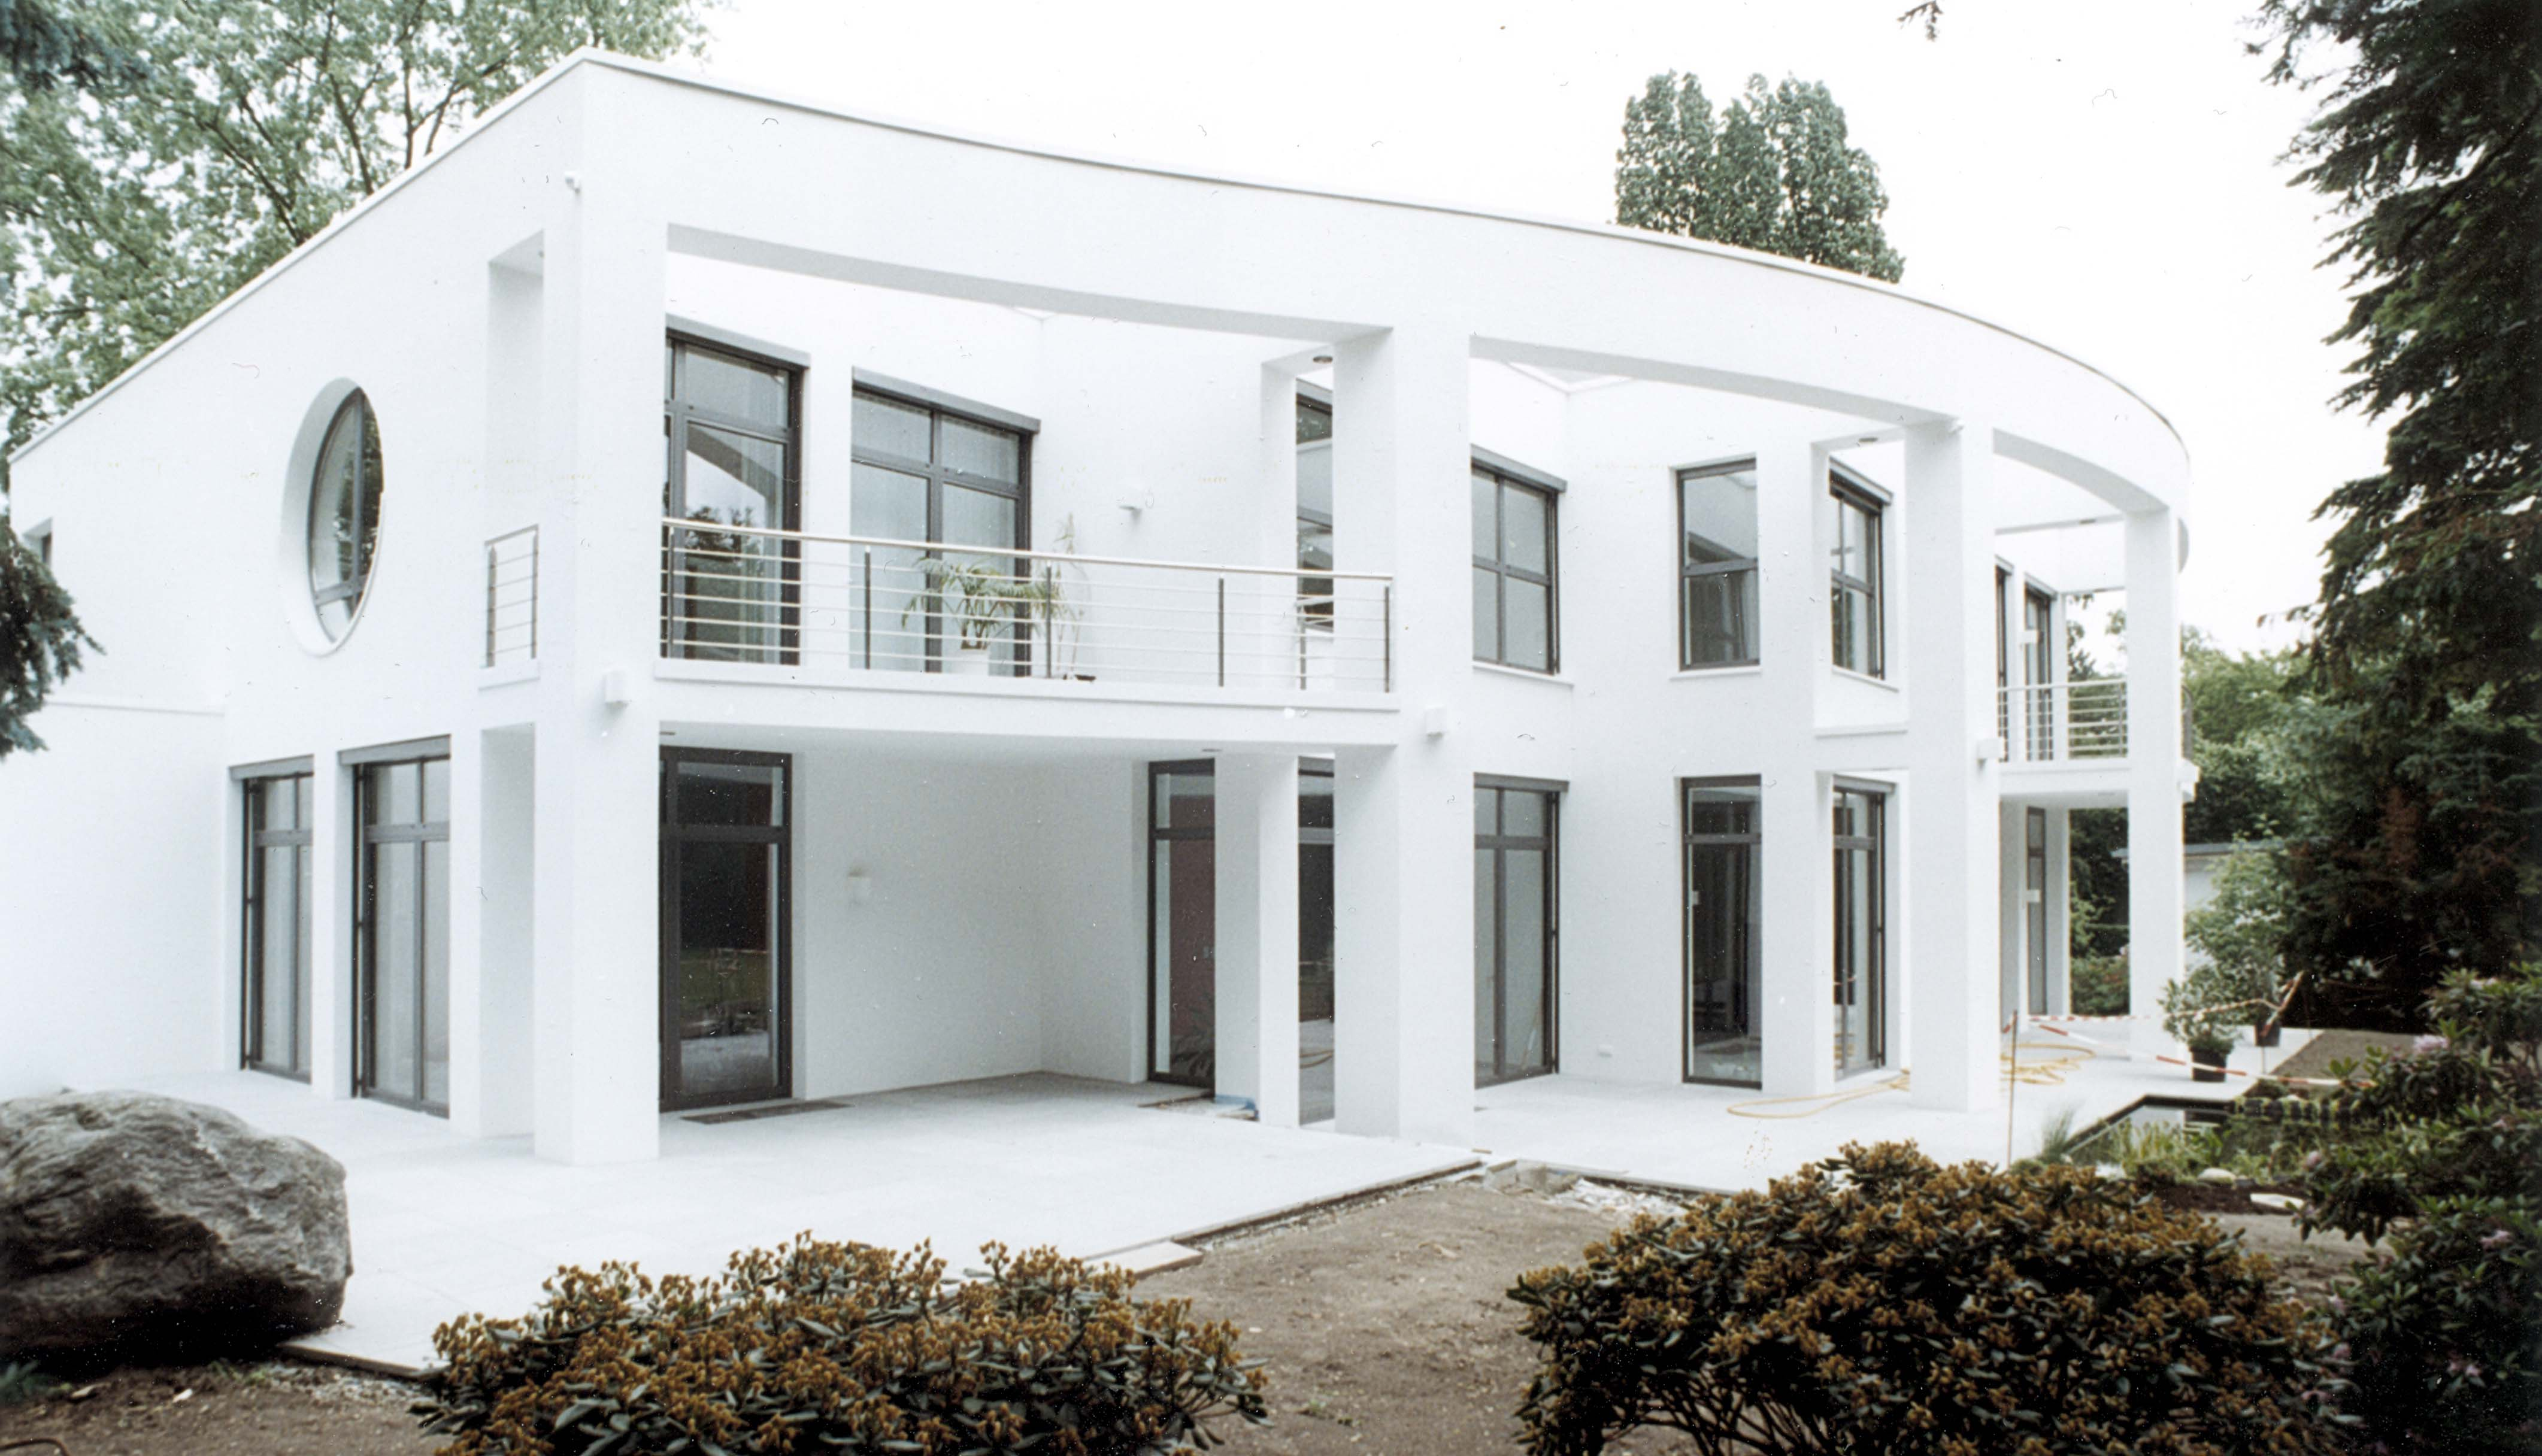 35 Villa in Westend 04